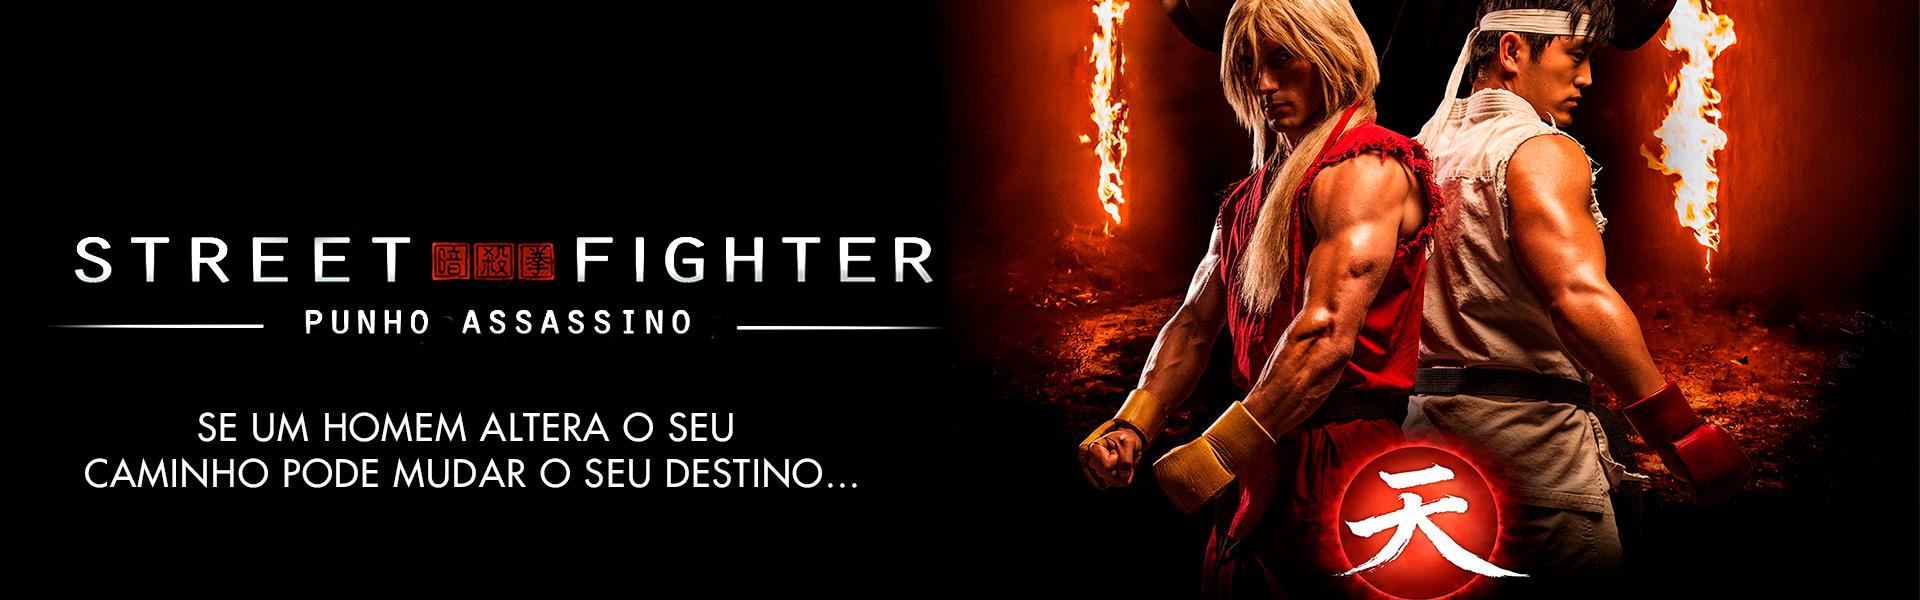 Street Fighter: Punho Assassino